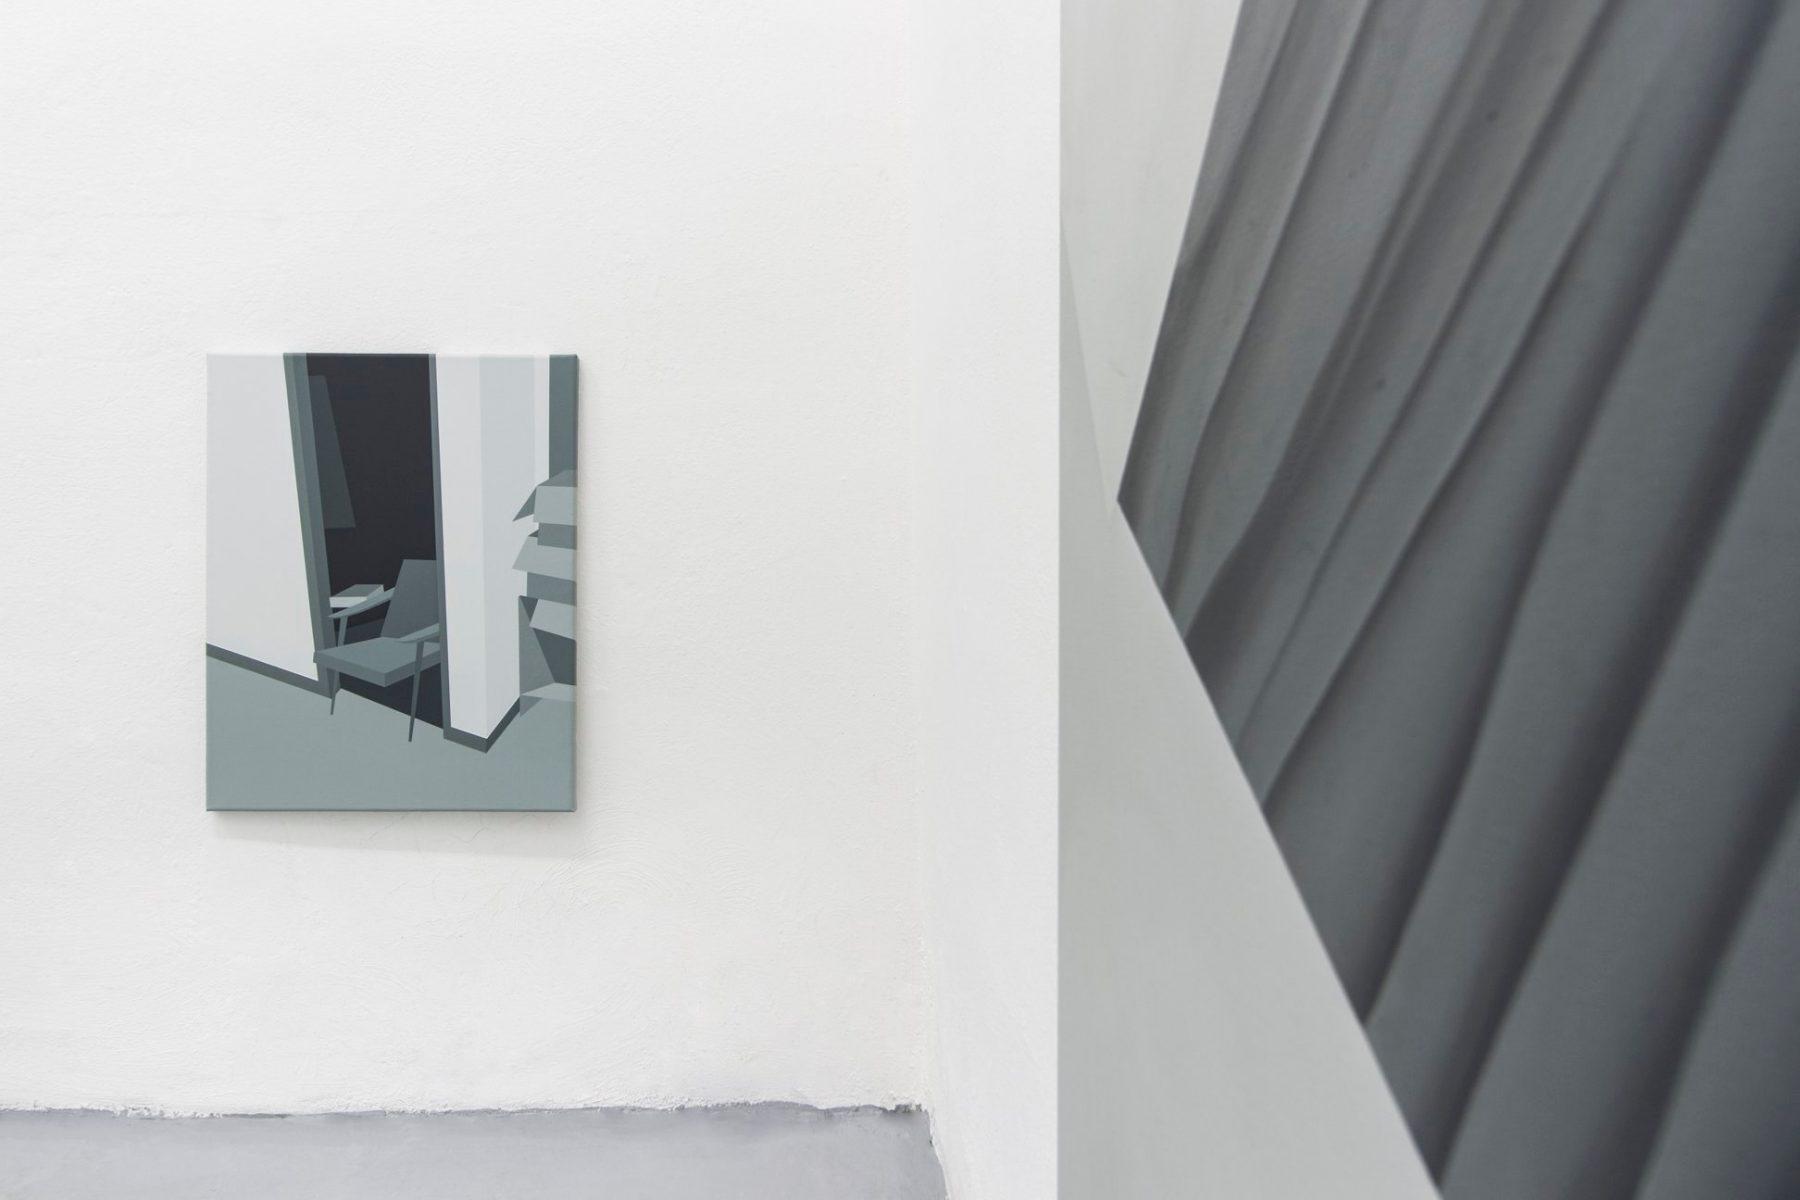 Alexandra Barth, Evidence of Absence, Hotdock